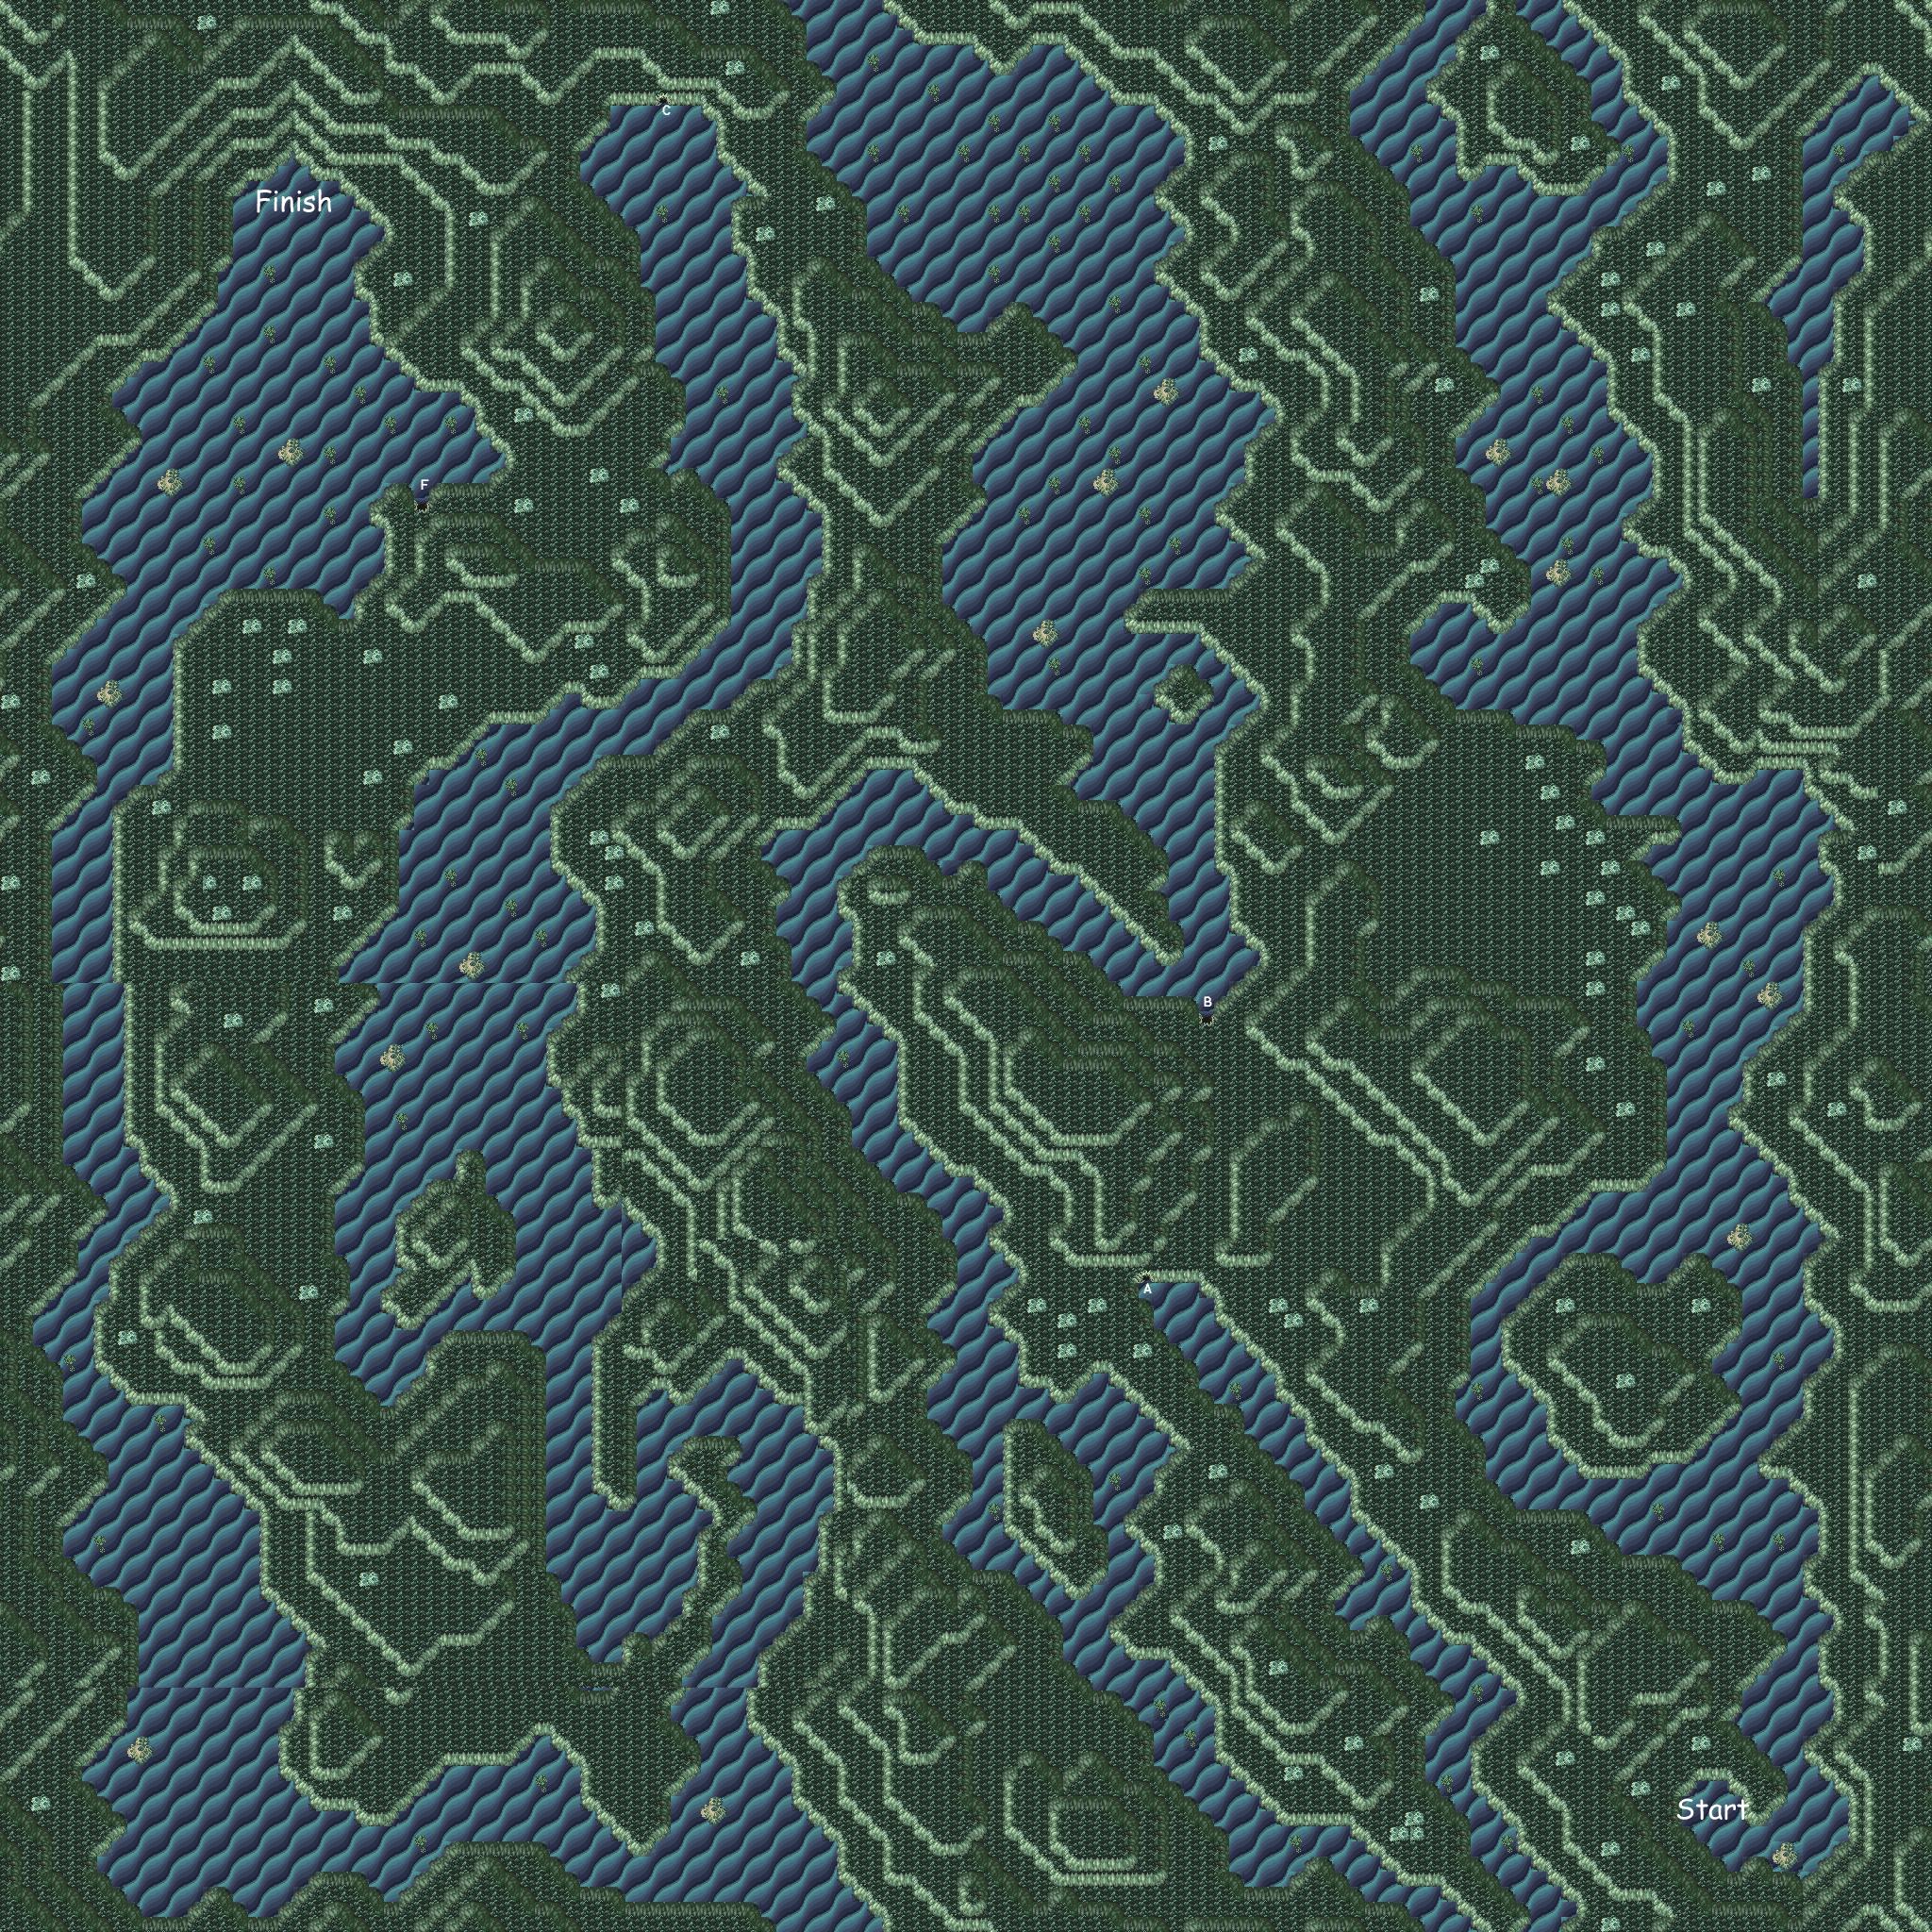 Final Fantasy VI World maps